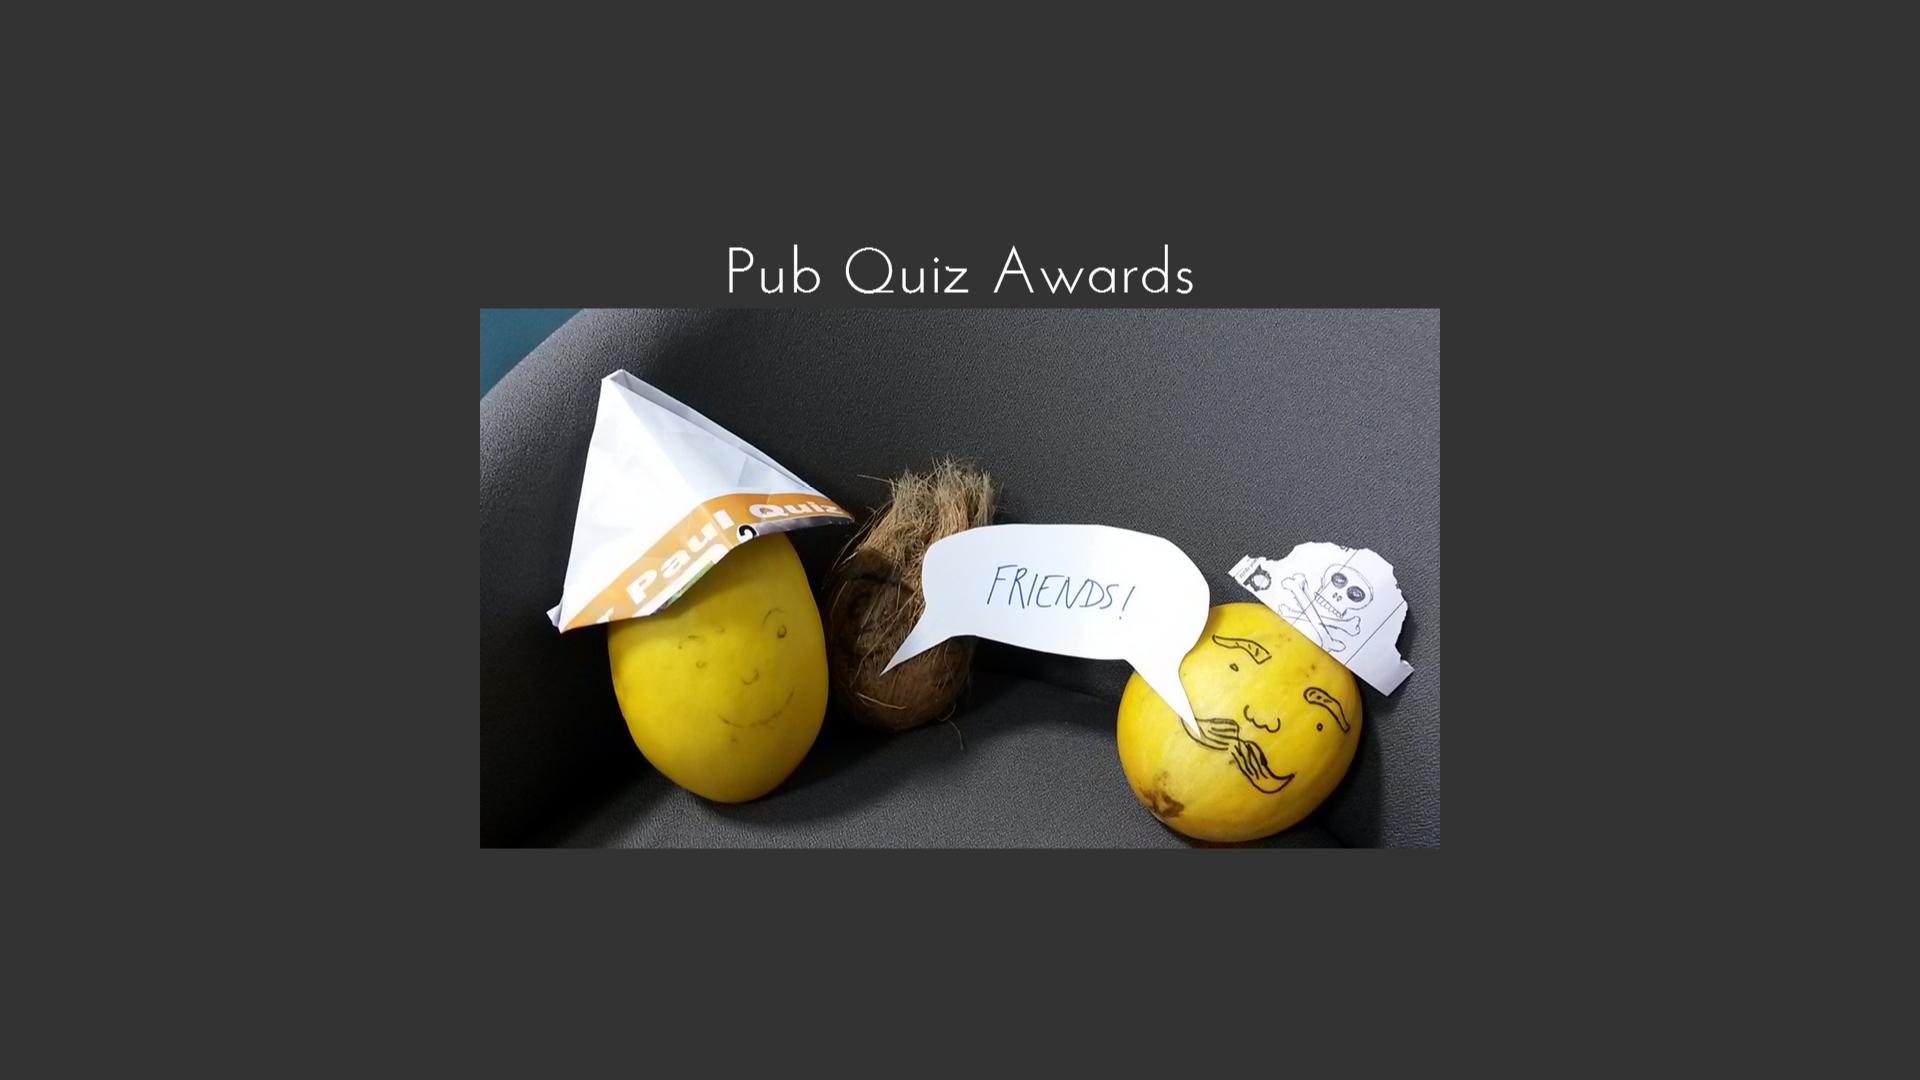 Pub Quiz Awards